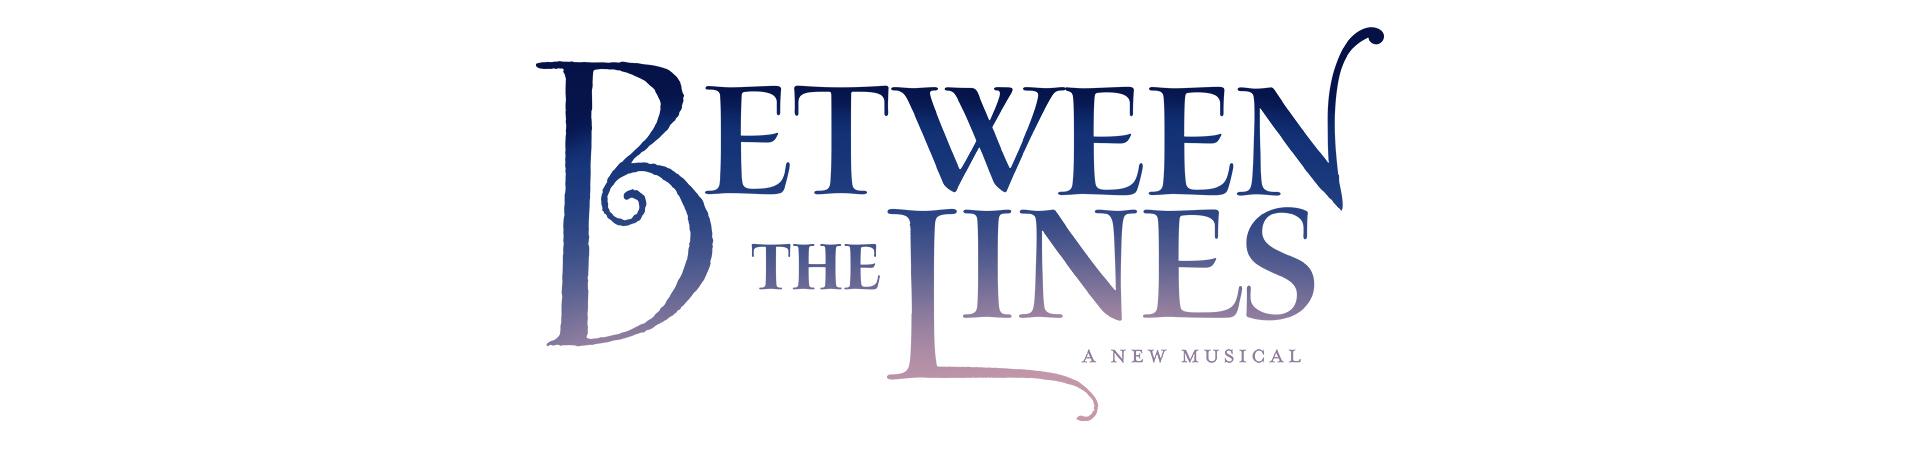 Between the Lines image